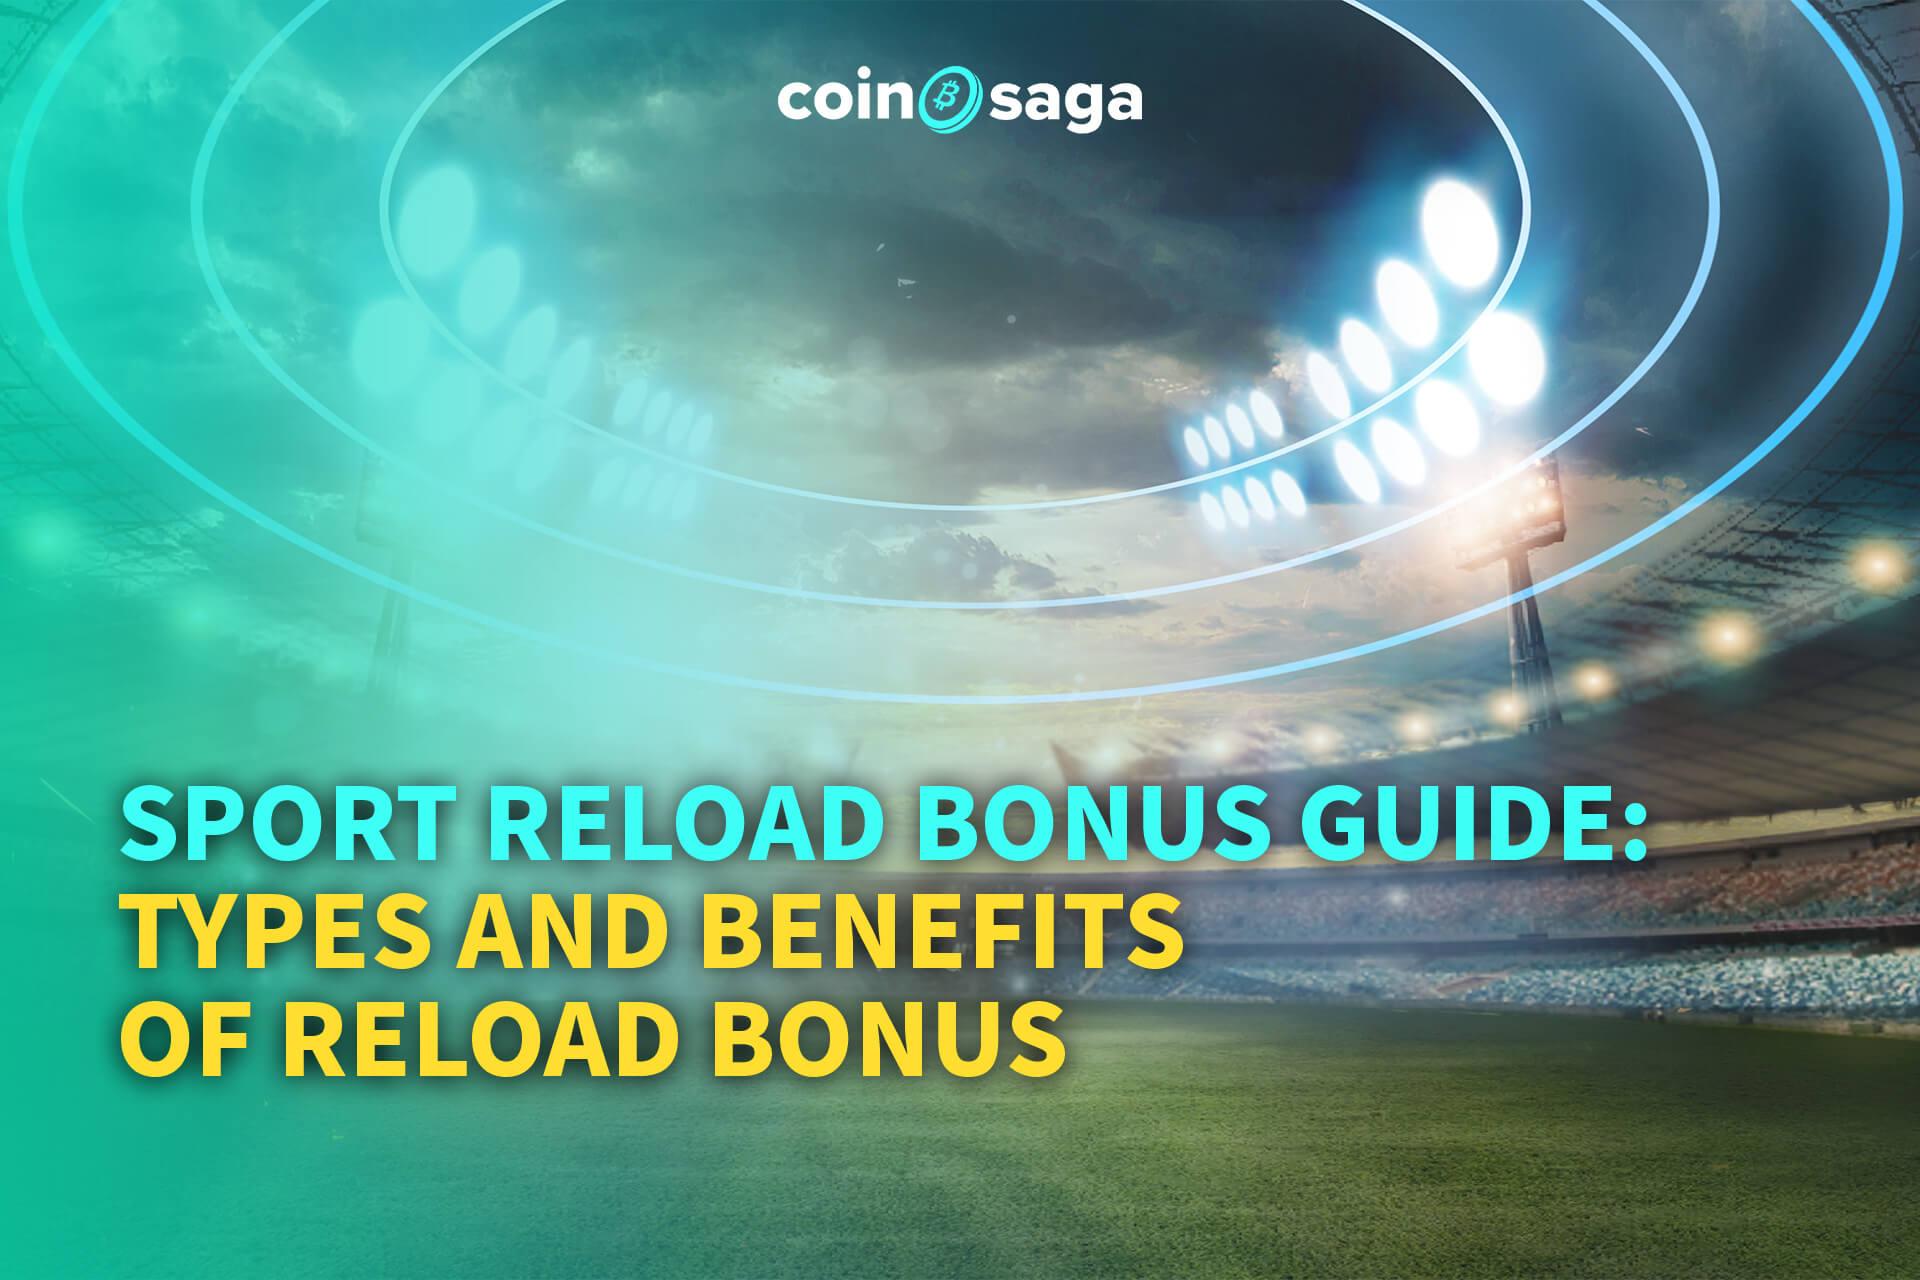 Sport reload bonus